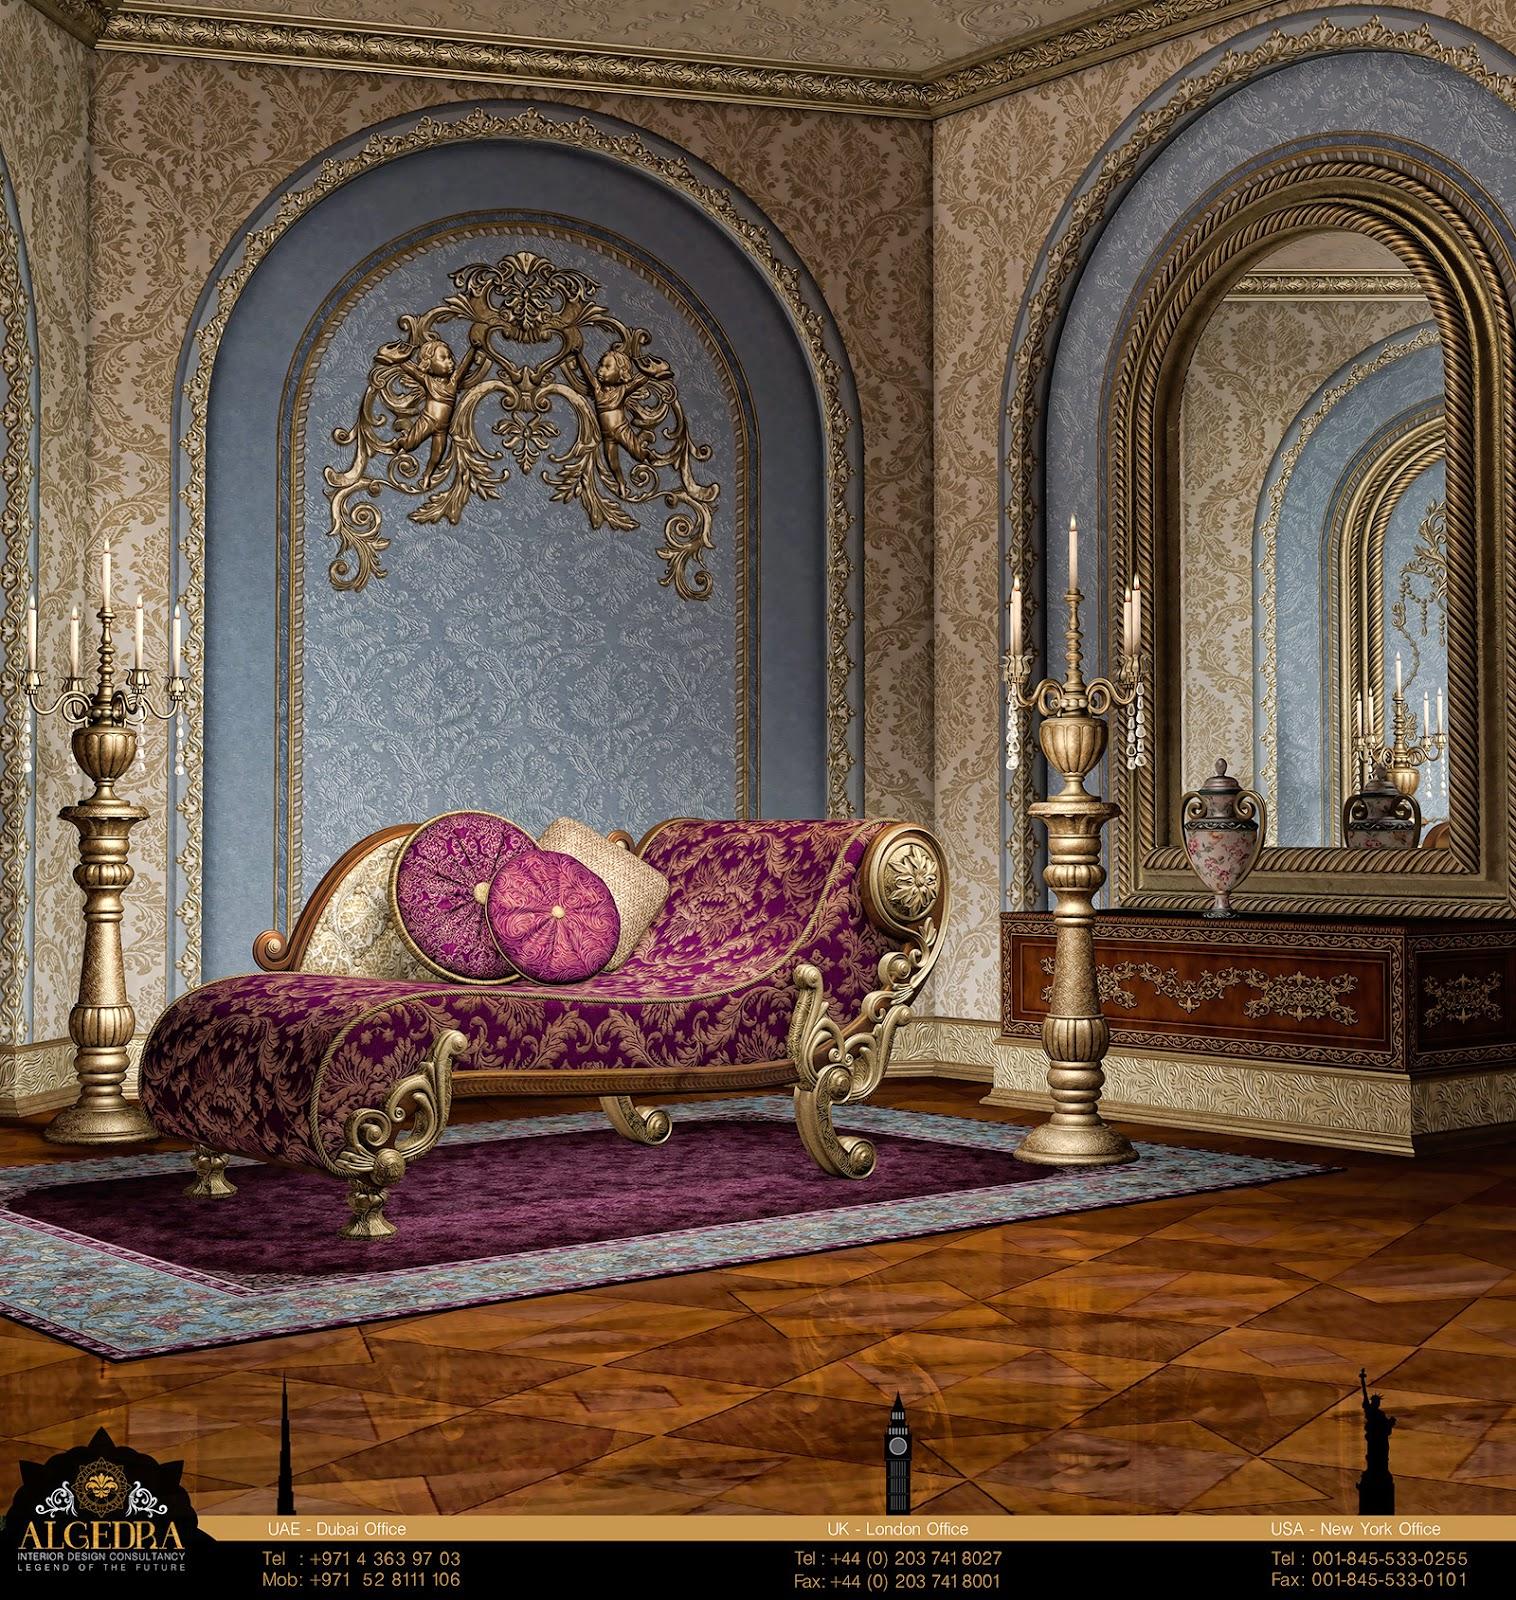 baroque style interior design by algedra